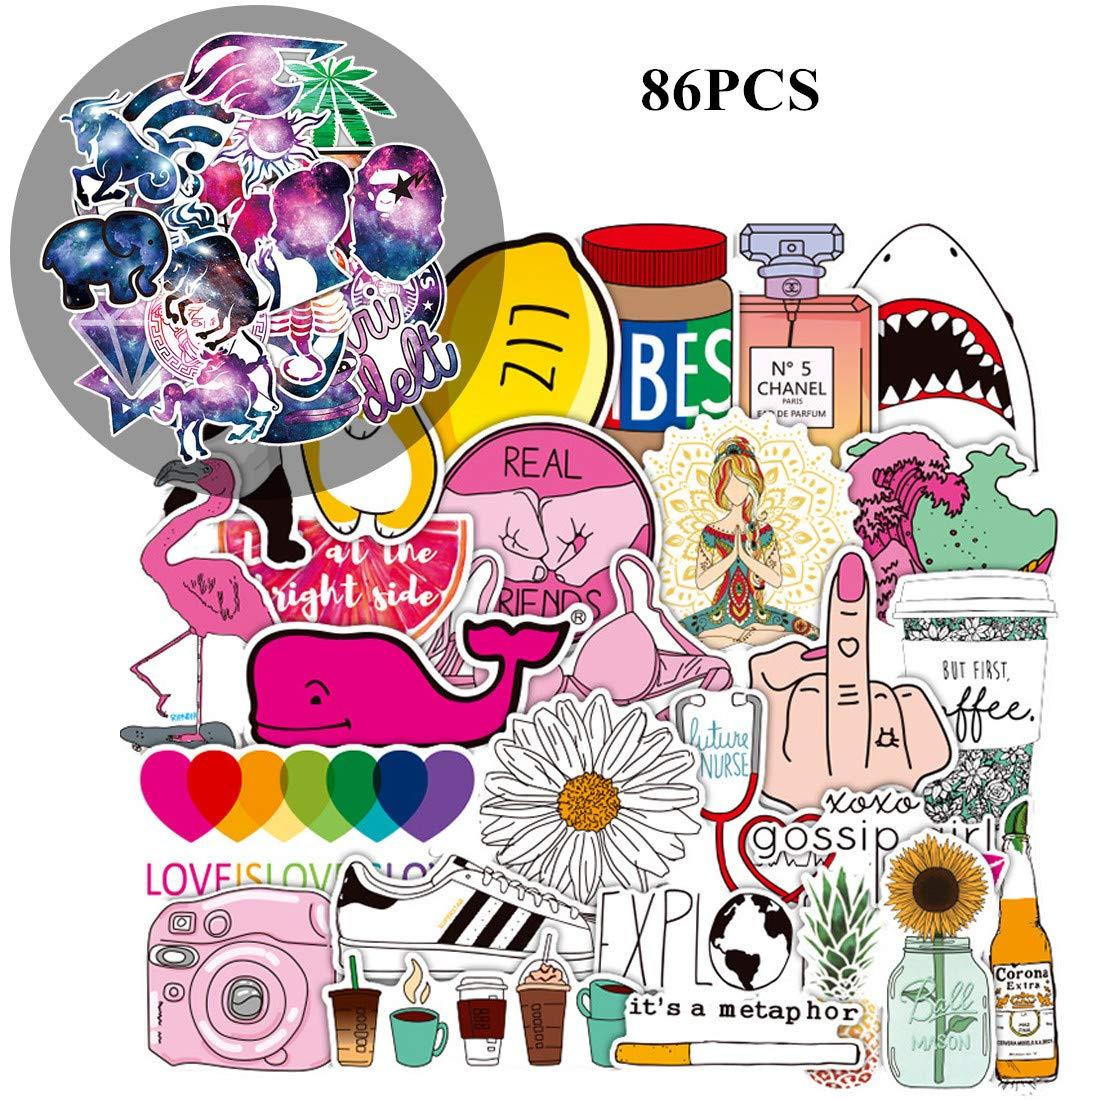 Stickers Calcos 86 un. Surtidos Origen U.S.A. (7SXFLZXR)